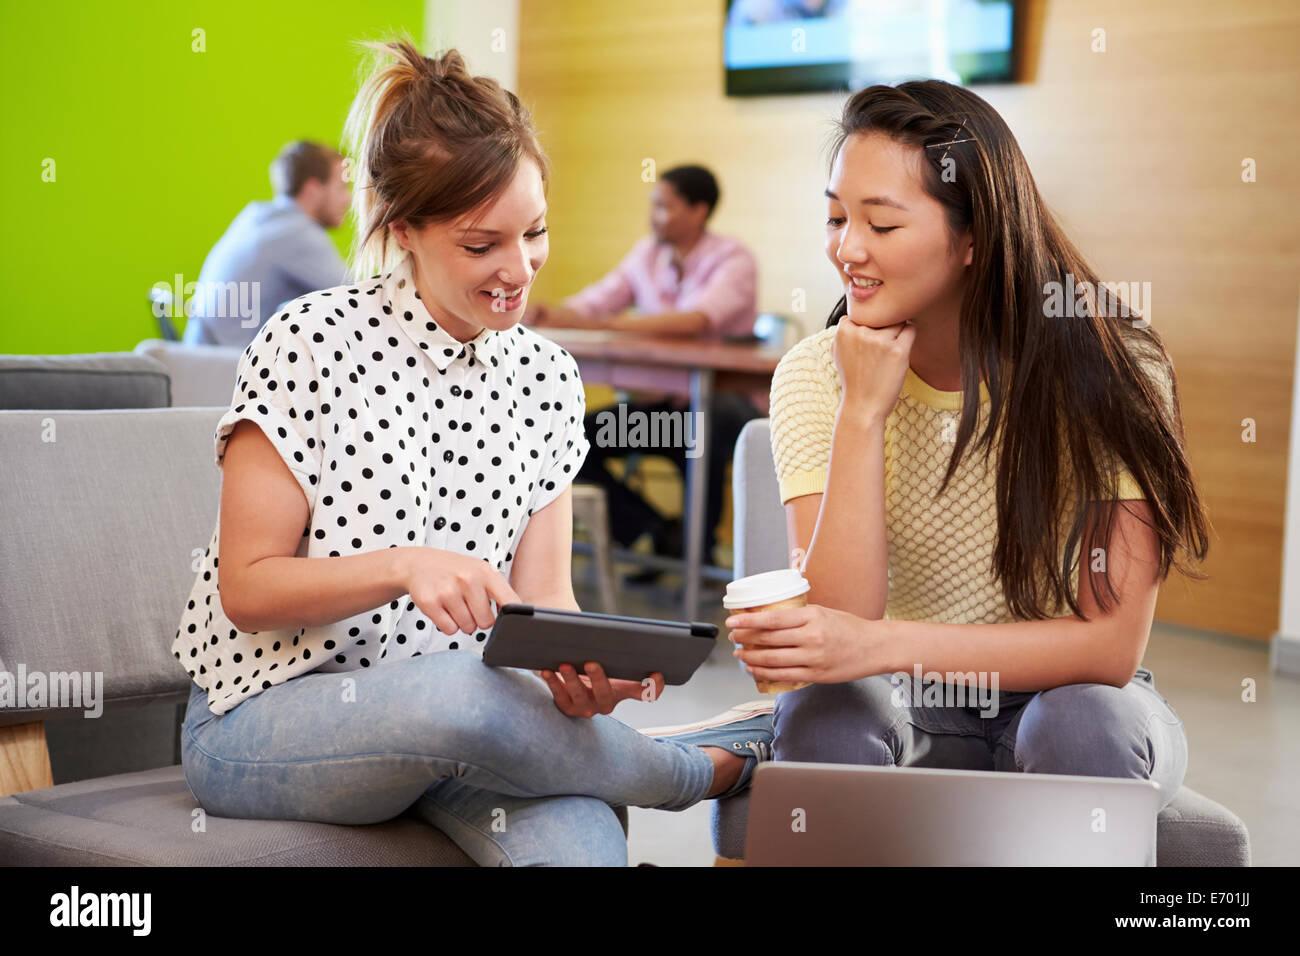 Creatives Having Informal Meeting On Sofas In Design Studio - Stock Image